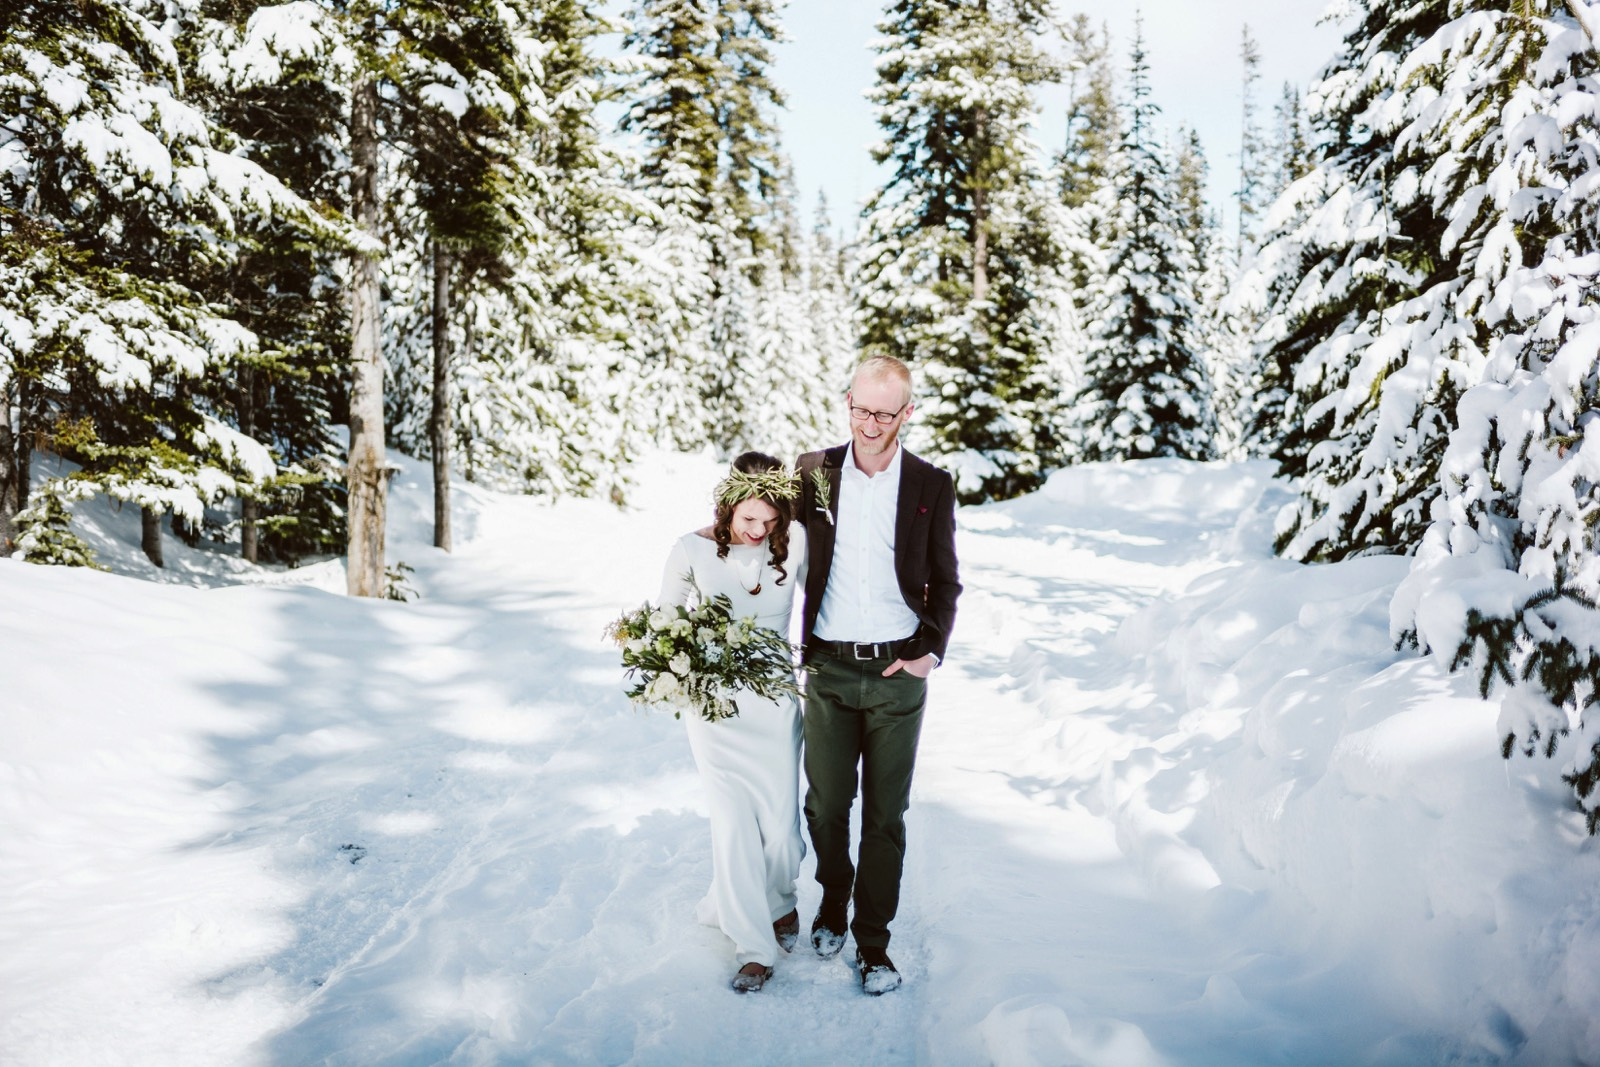 alpine-lakes-high-camp-winter-wedding-21 ALPINE LAKES HIGH CAMP WEDDING